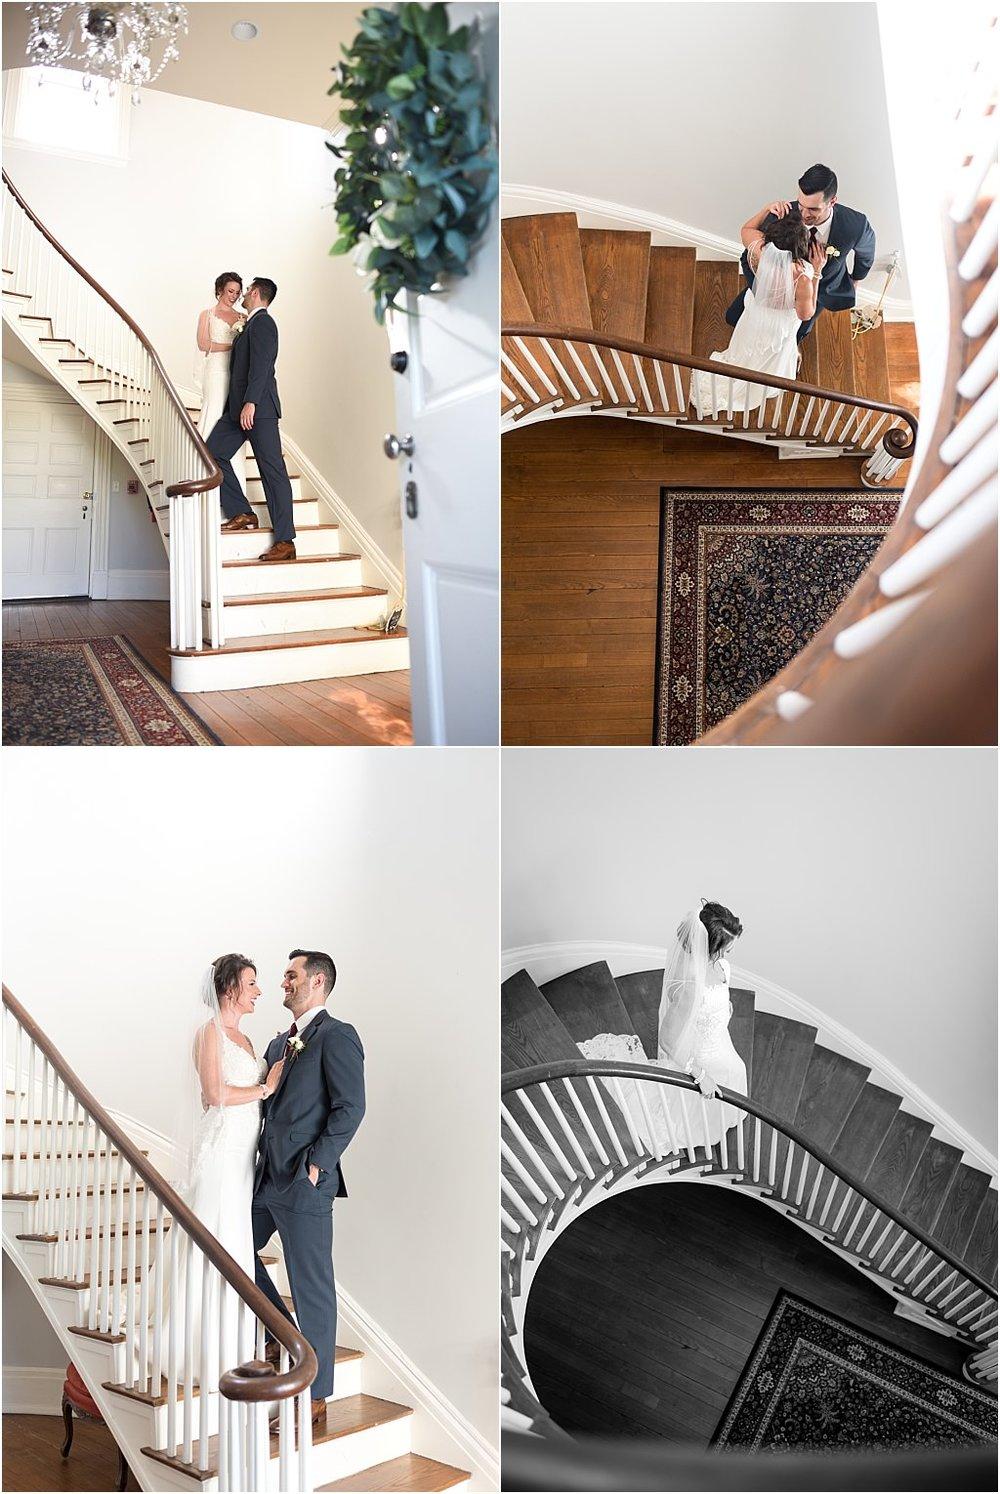 Jordan-and-Anna-Ravenswood-Mansion-Wedding-in-Brentwood-TN-Nashville-Wedding-Photographers+5